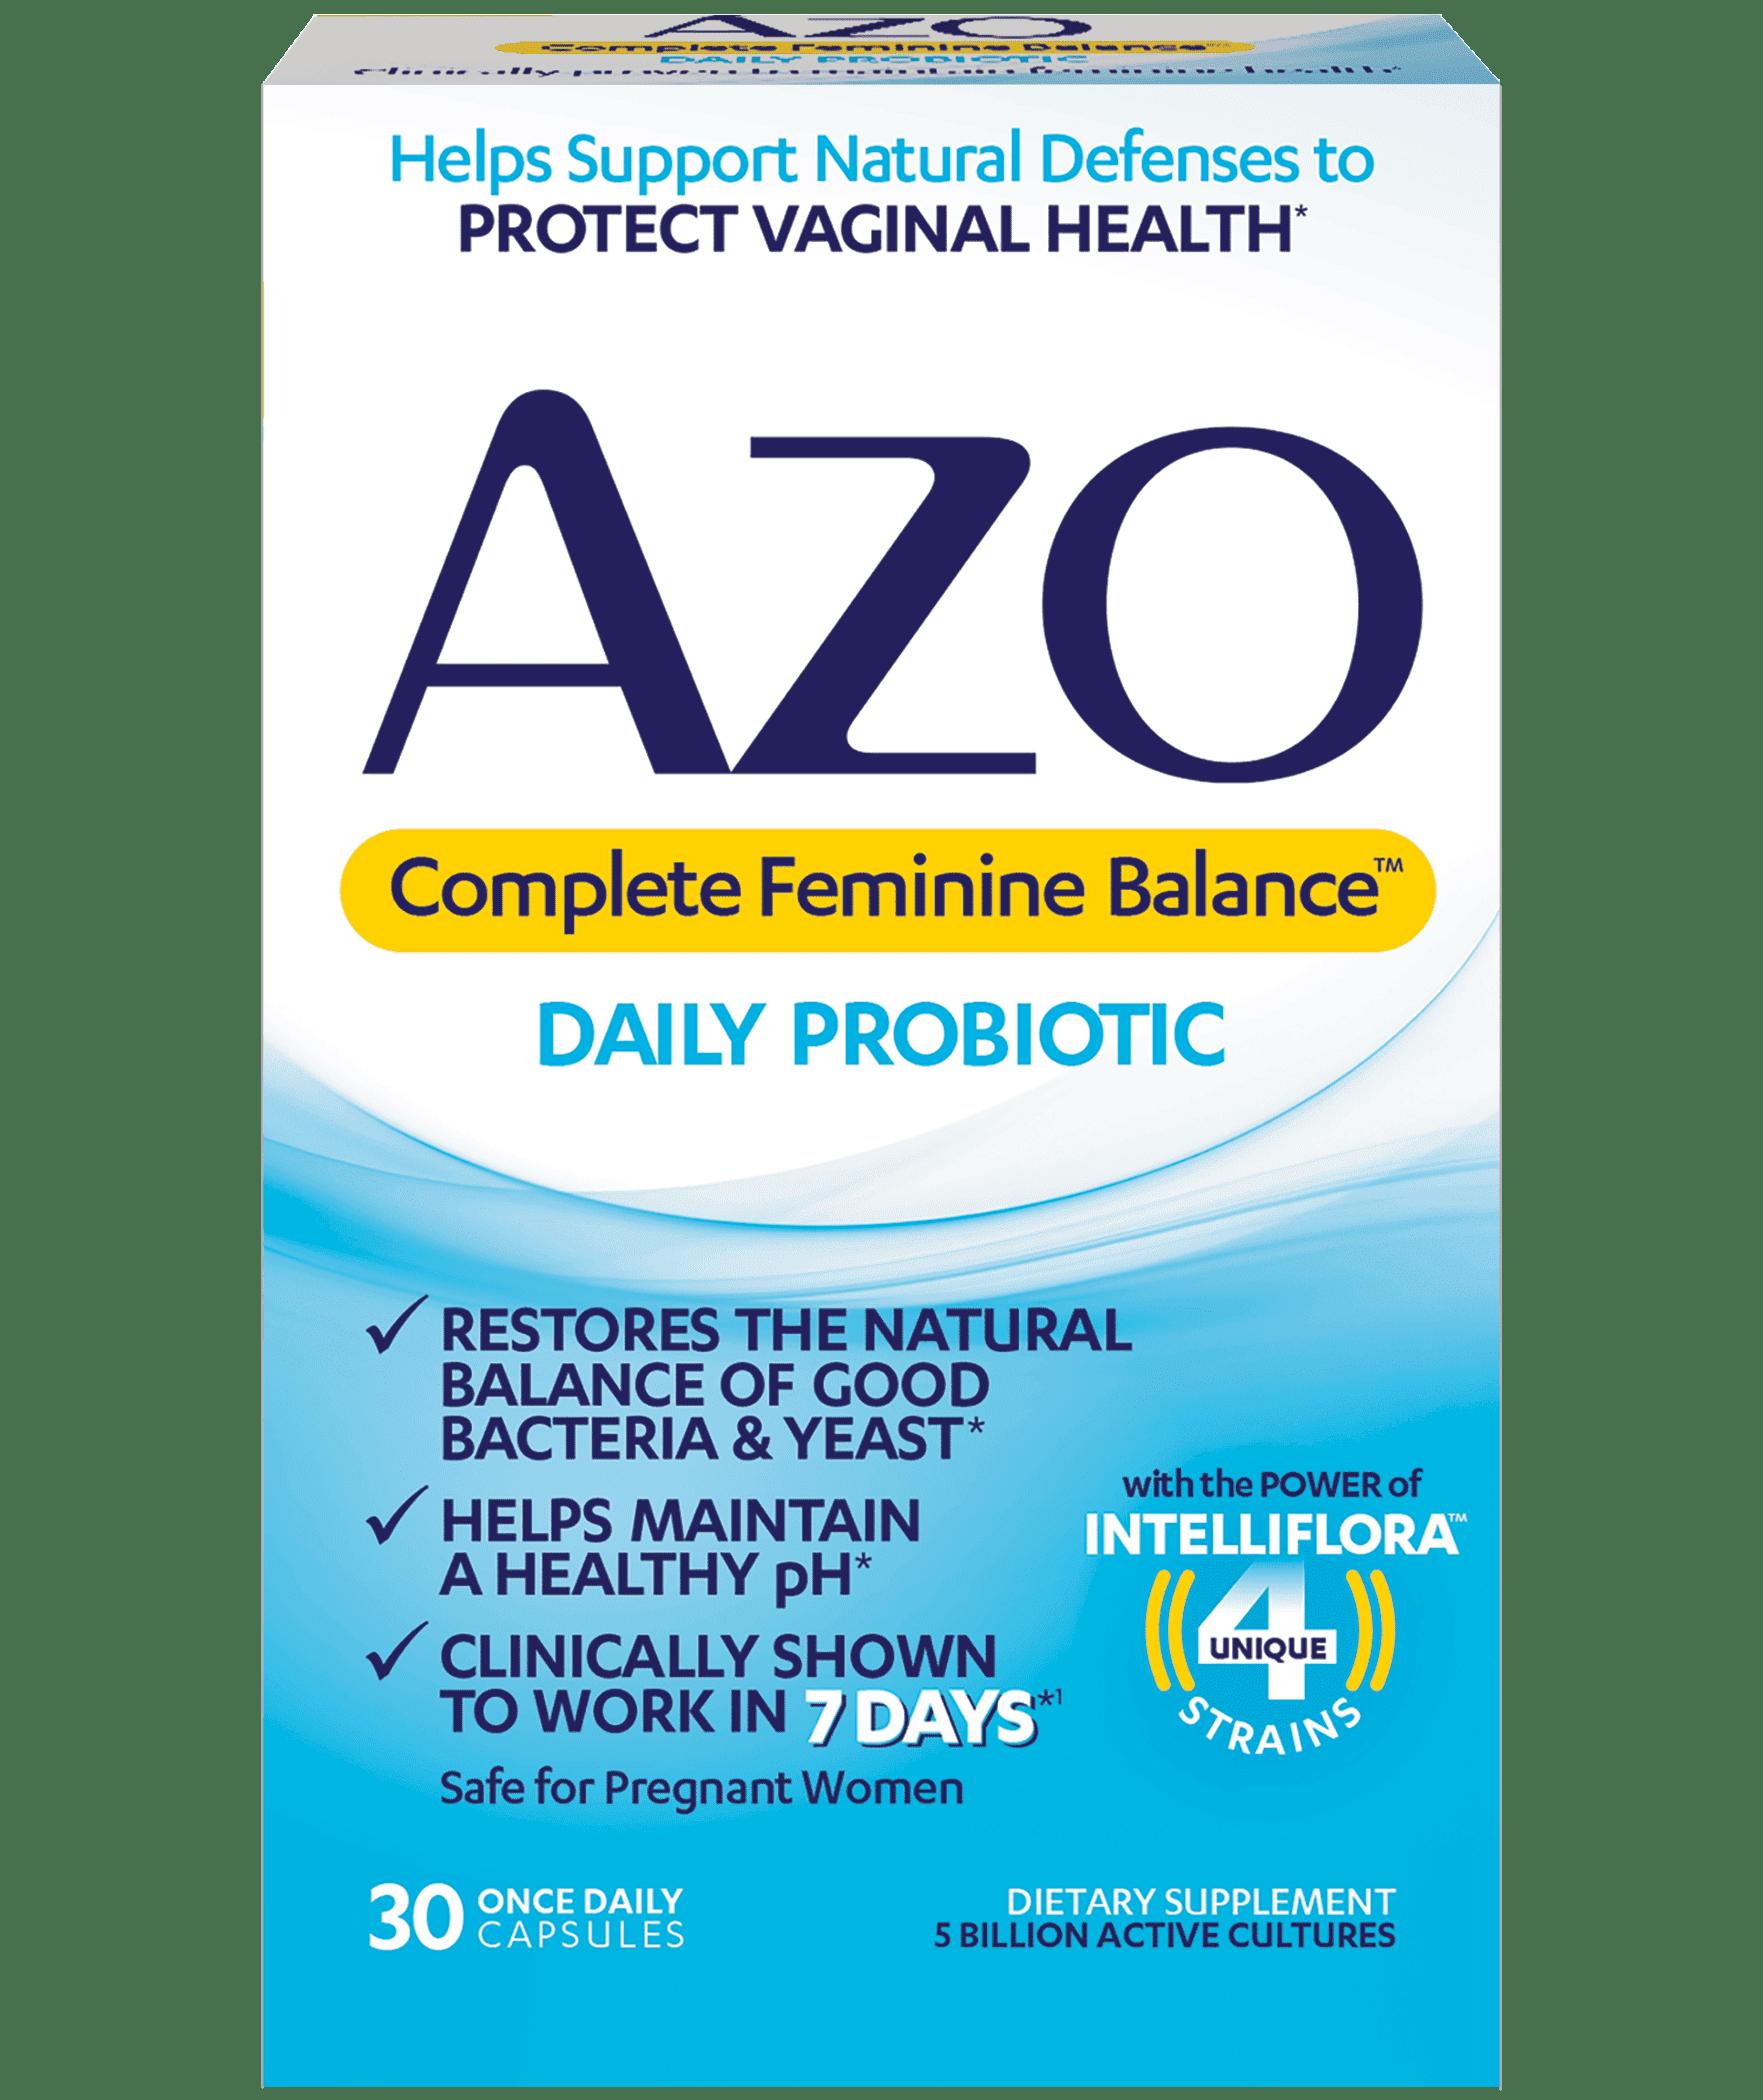 AZO Complete Feminine Balance, Daily Probiotic for Women, Supports Vaginal  Health, 30 ct - Walmart.com - Walmart.com